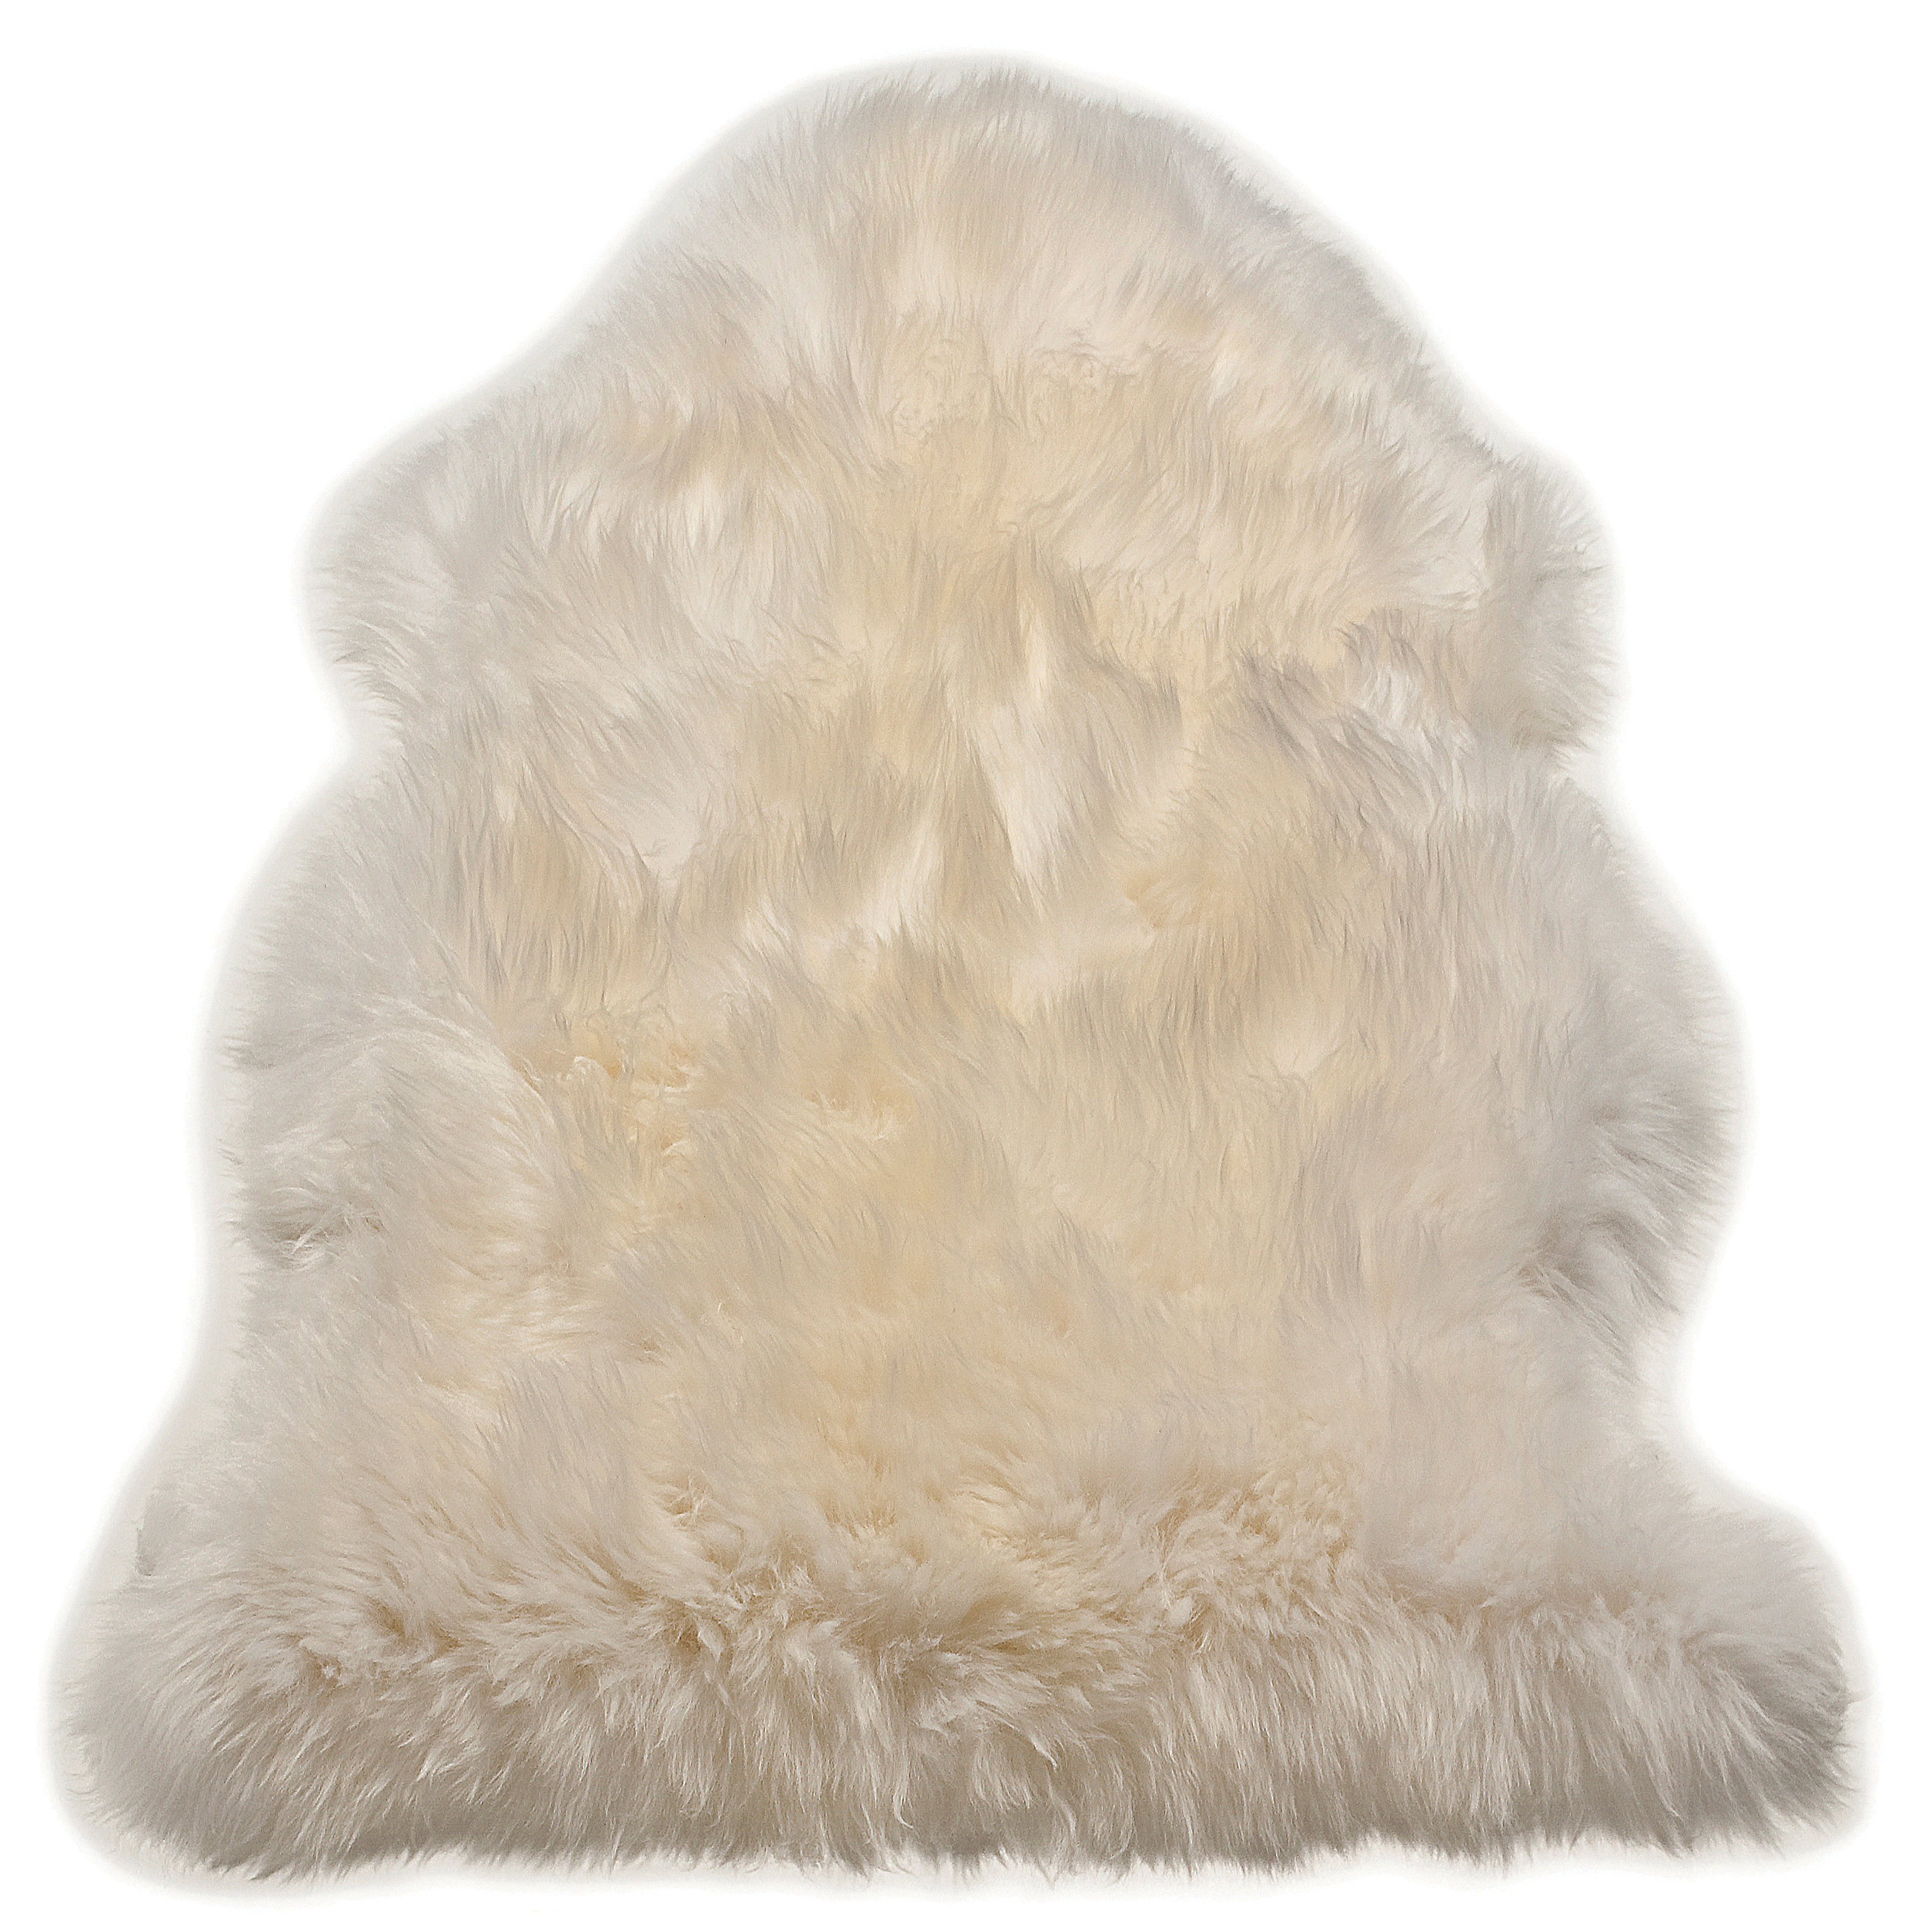 Sheepskin Rugs in White.jpg